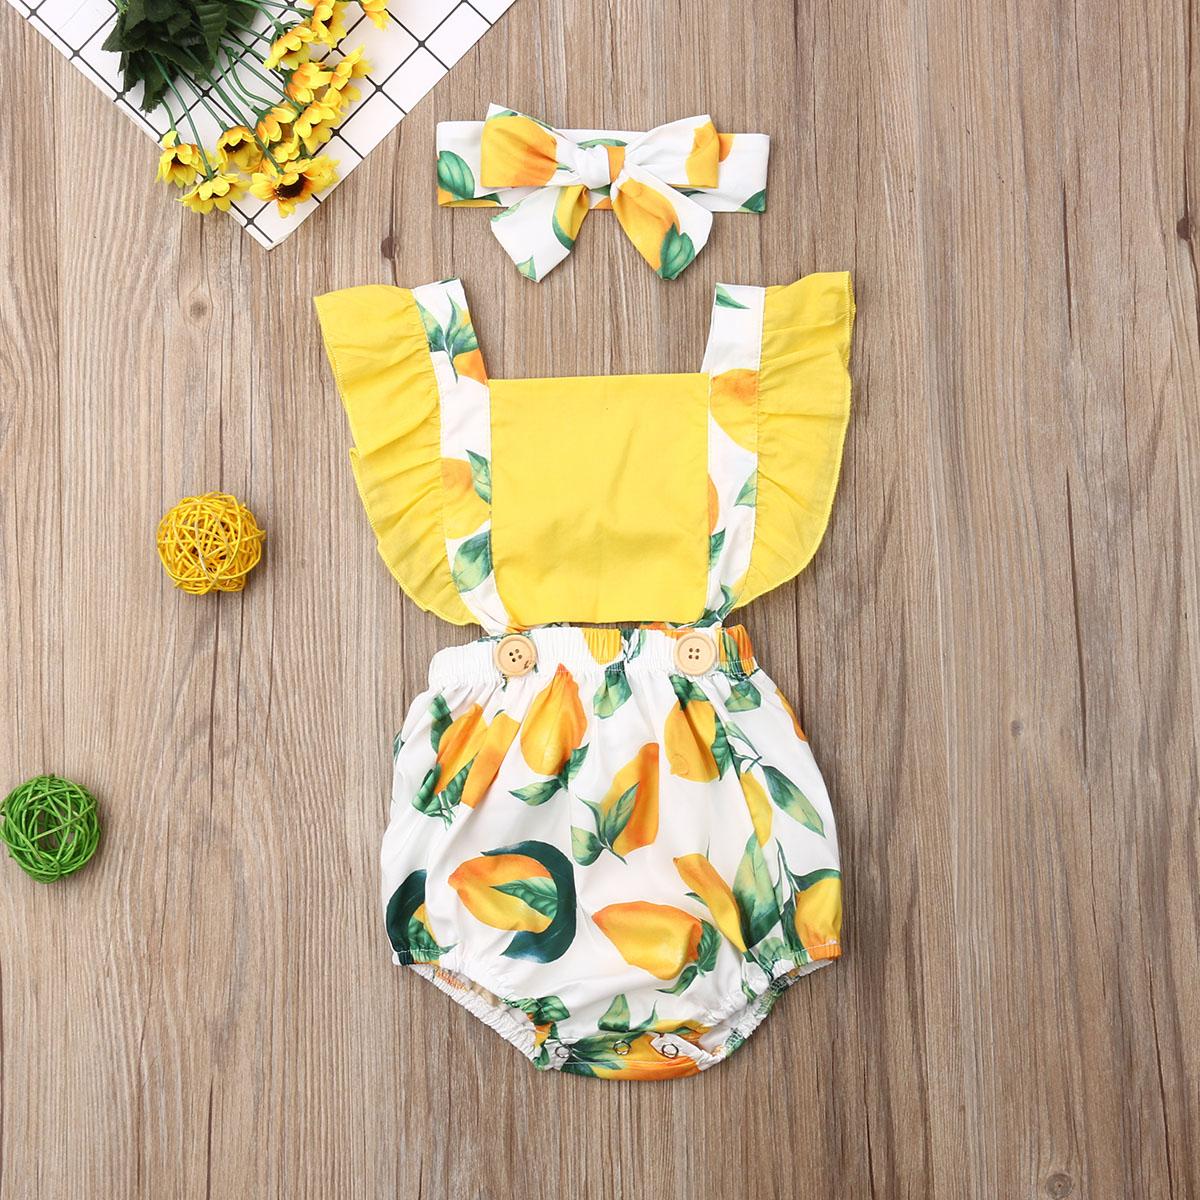 Baby Girl Romper Newborn Baby Girl Lemon Fruit Romper Sleeveless Jumpsuit Clothes  Summer Infant Baby Outfit Set 0-24M